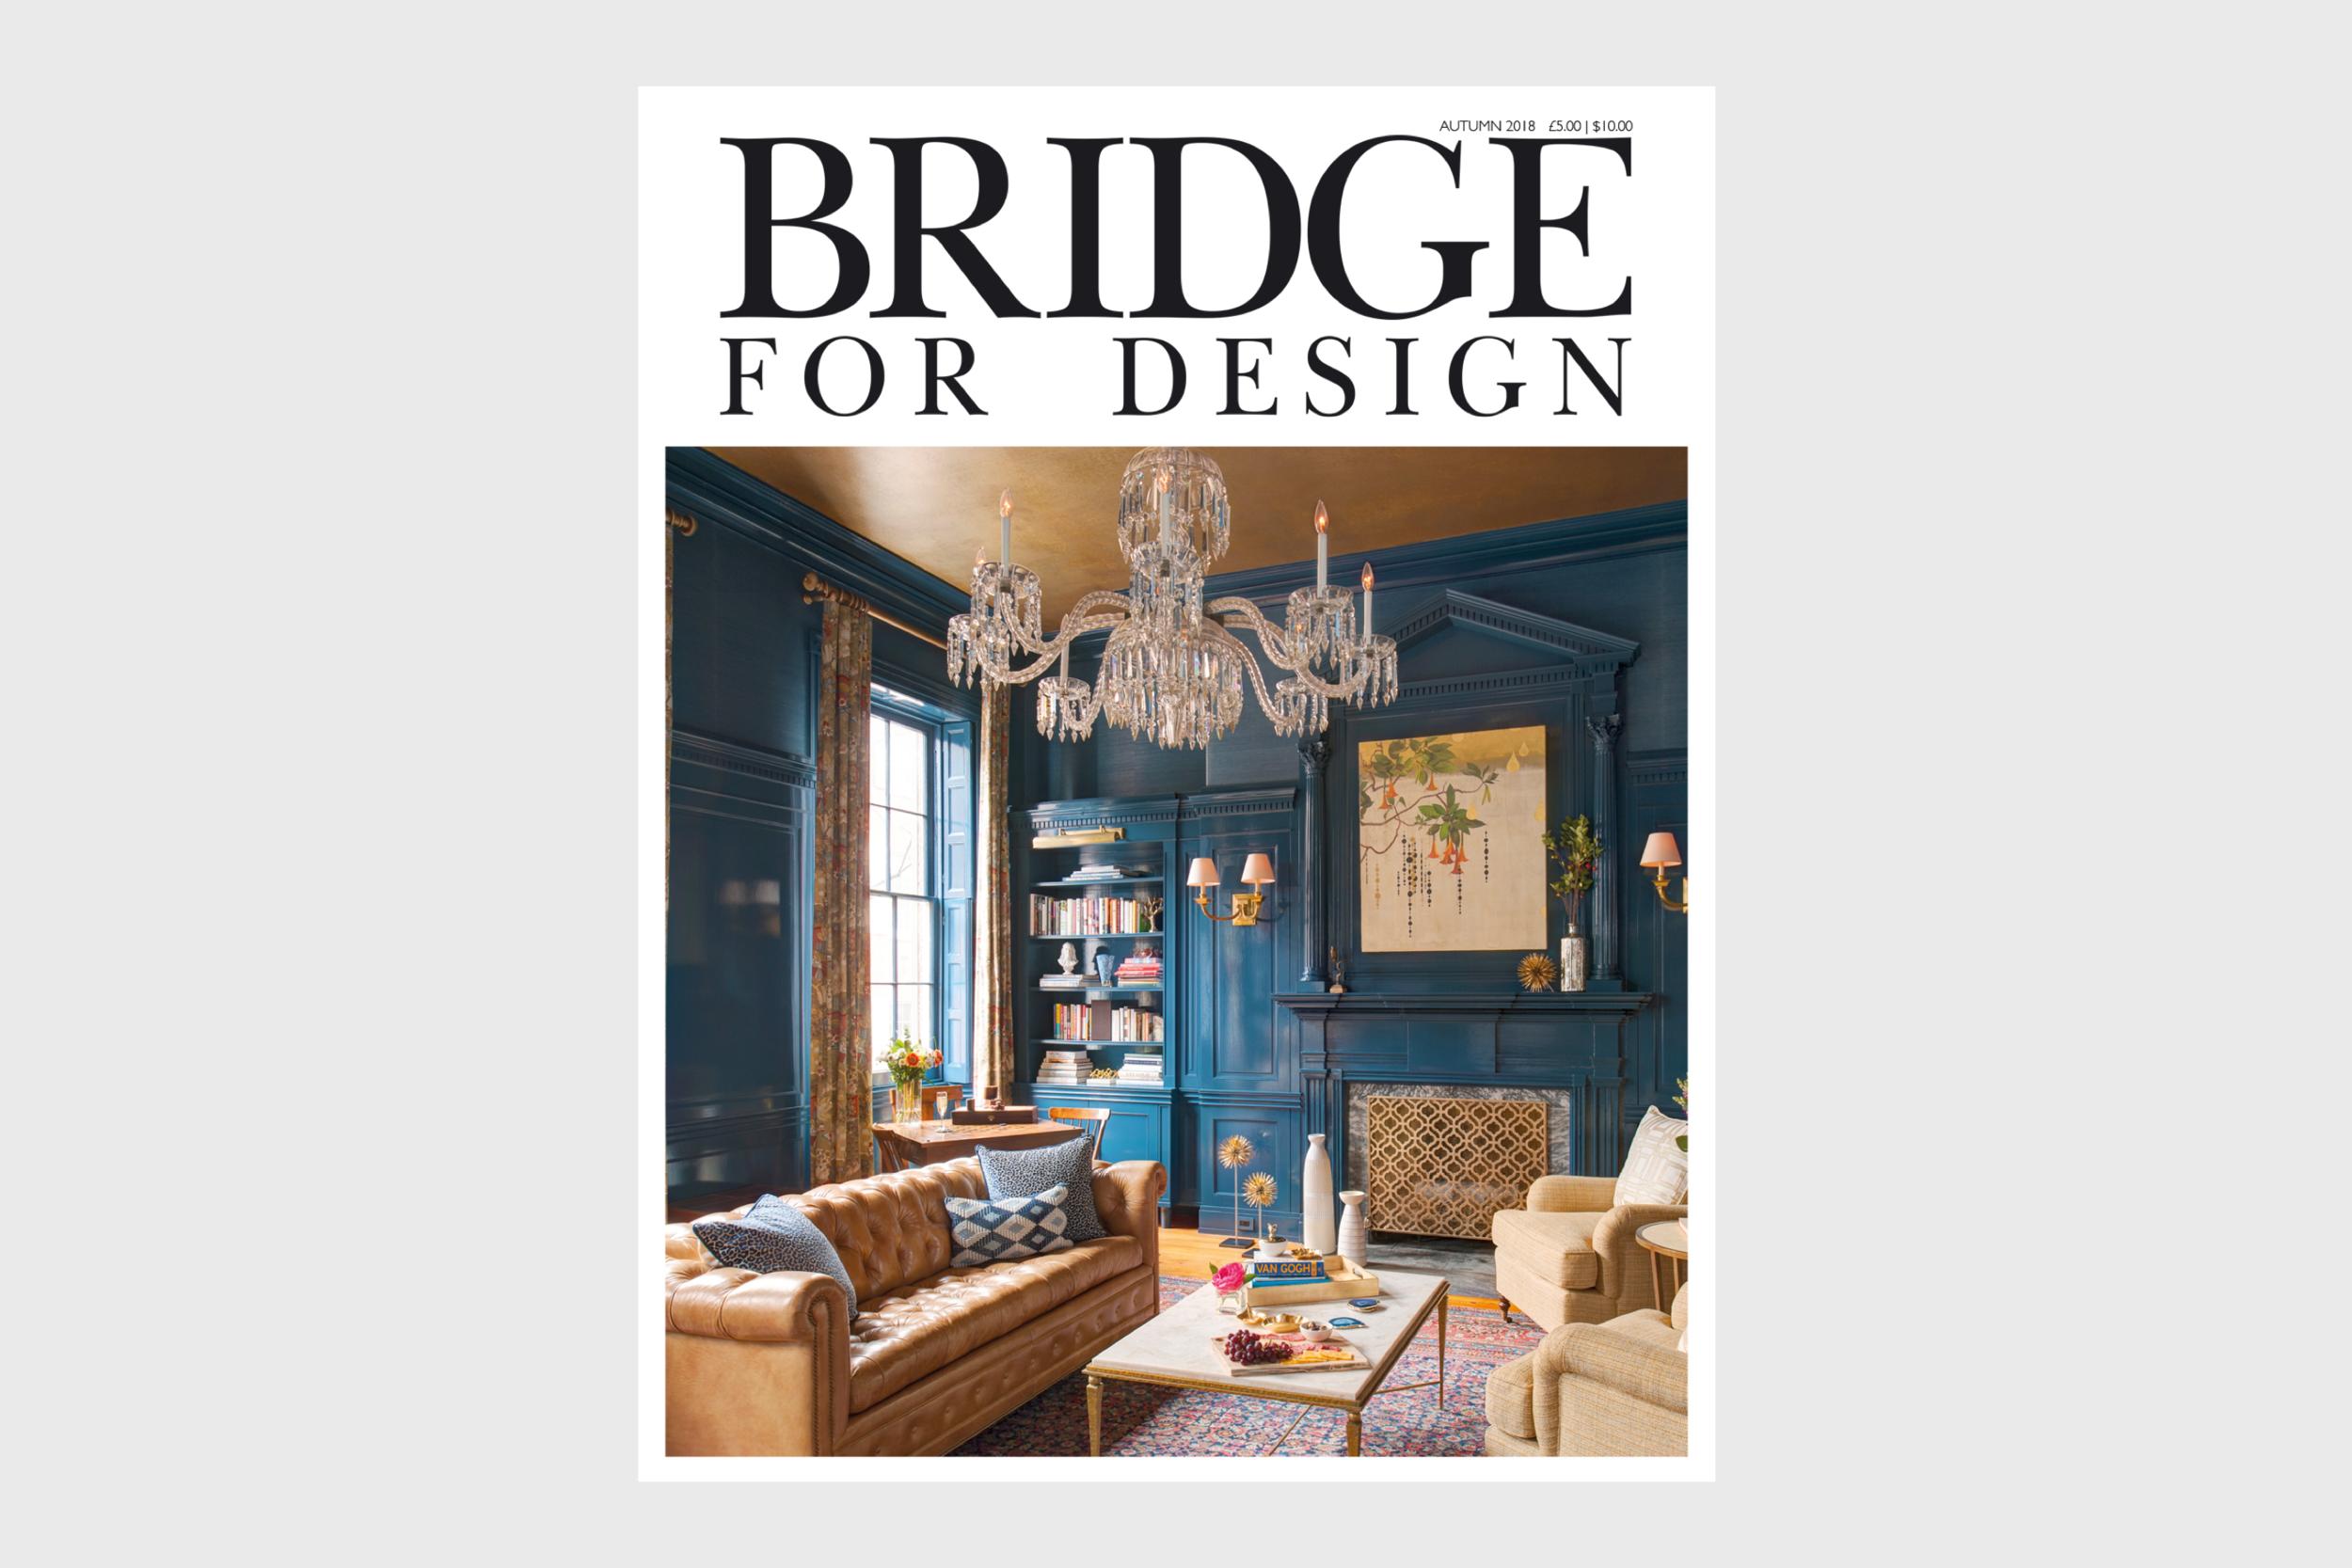 knof_press_bridge-for-design_2018-Autumn_01.png